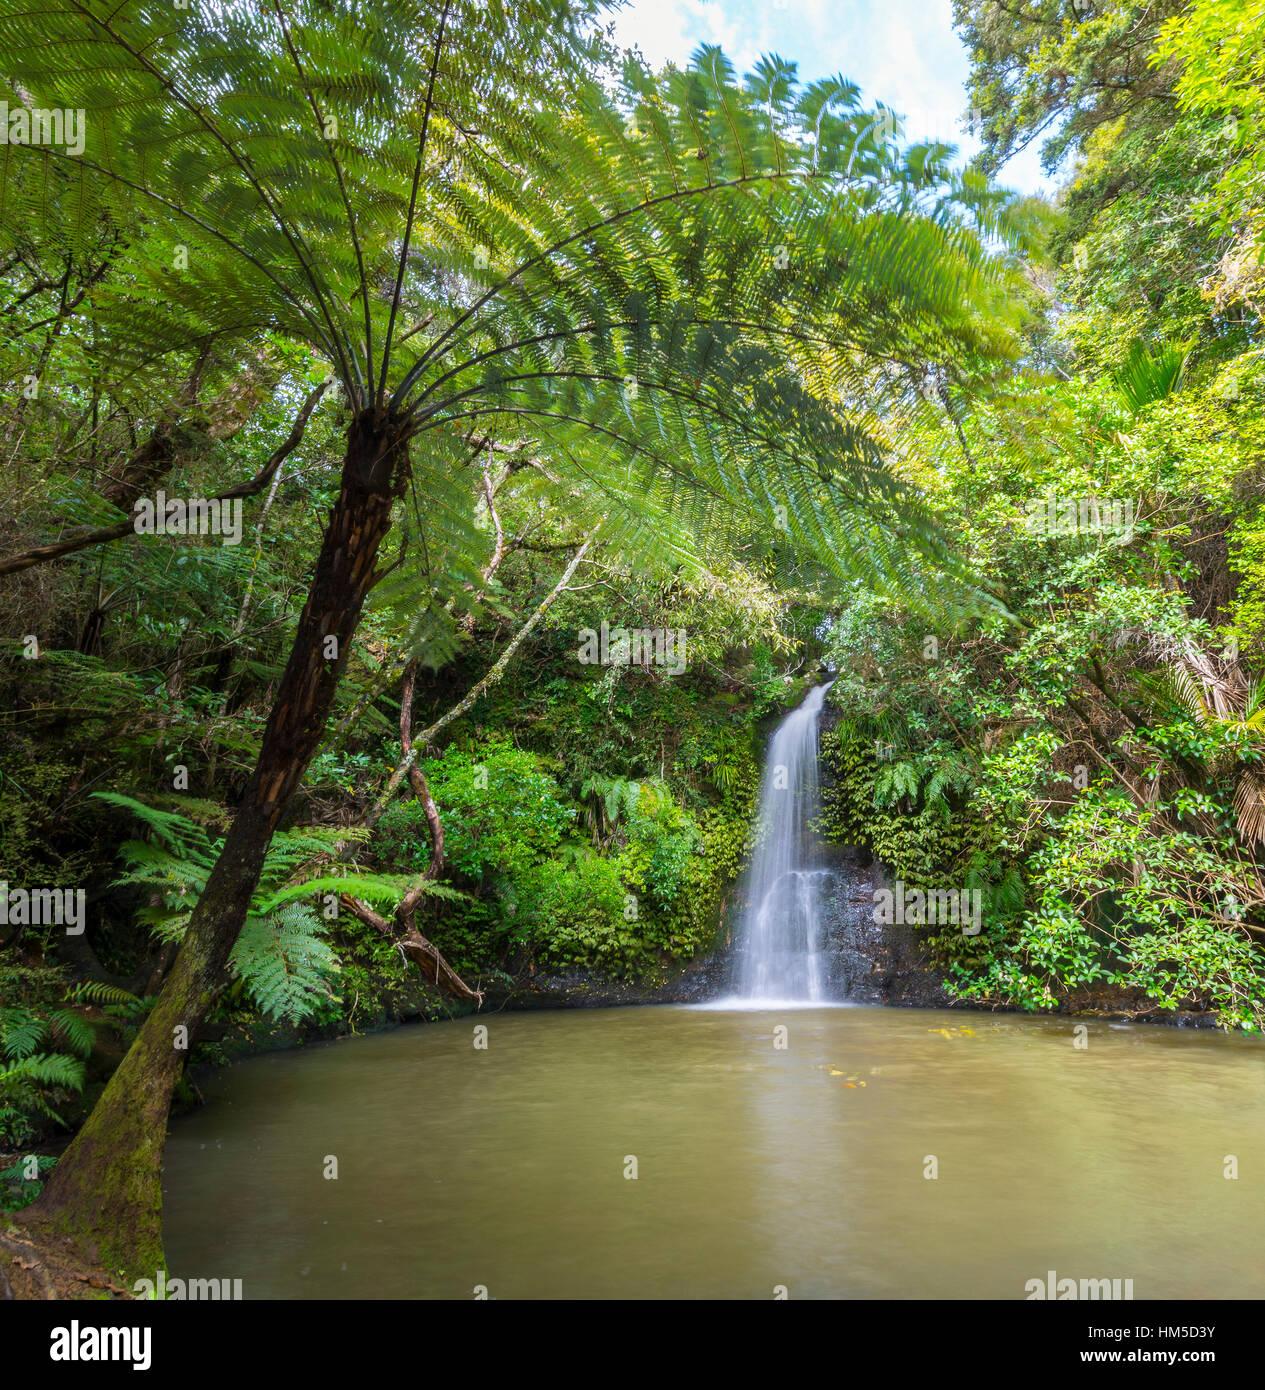 Chute d'eau, fougère arborescente (Cyatheales Omeru), réserver, Northland, North Island, New Zealand Photo Stock